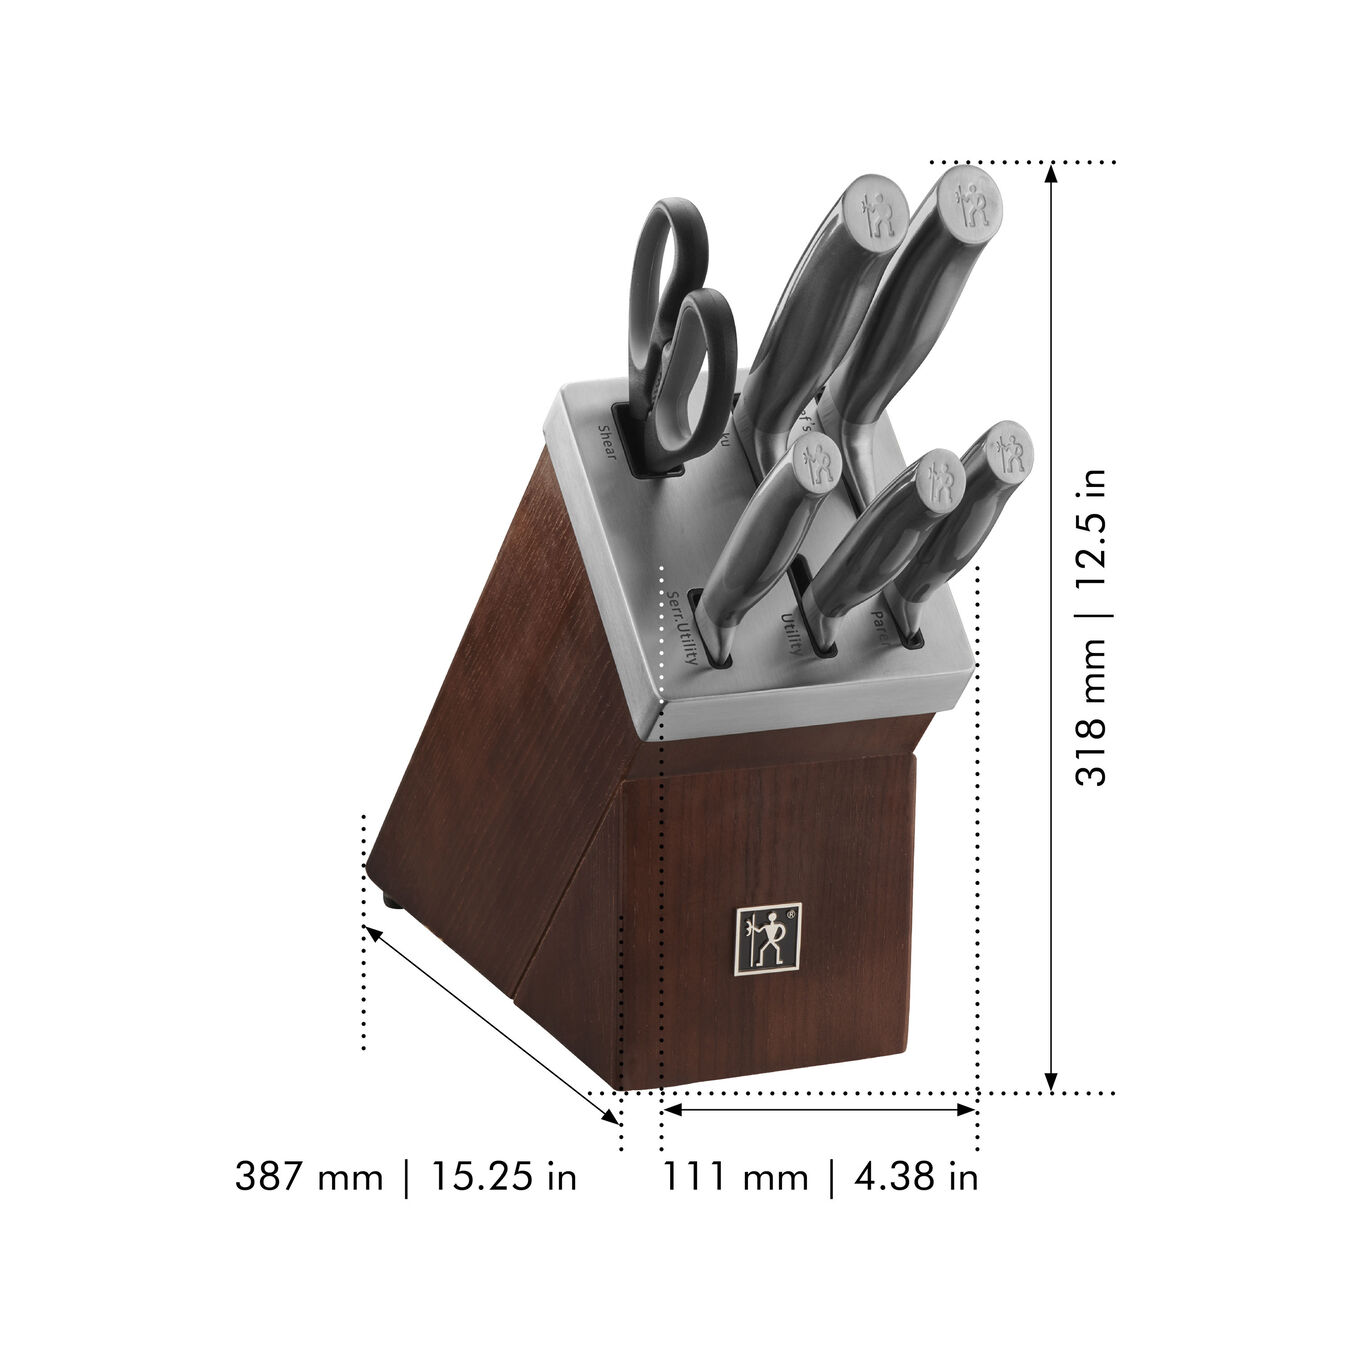 7-pc, Knife block set, graphite grey,,large 2